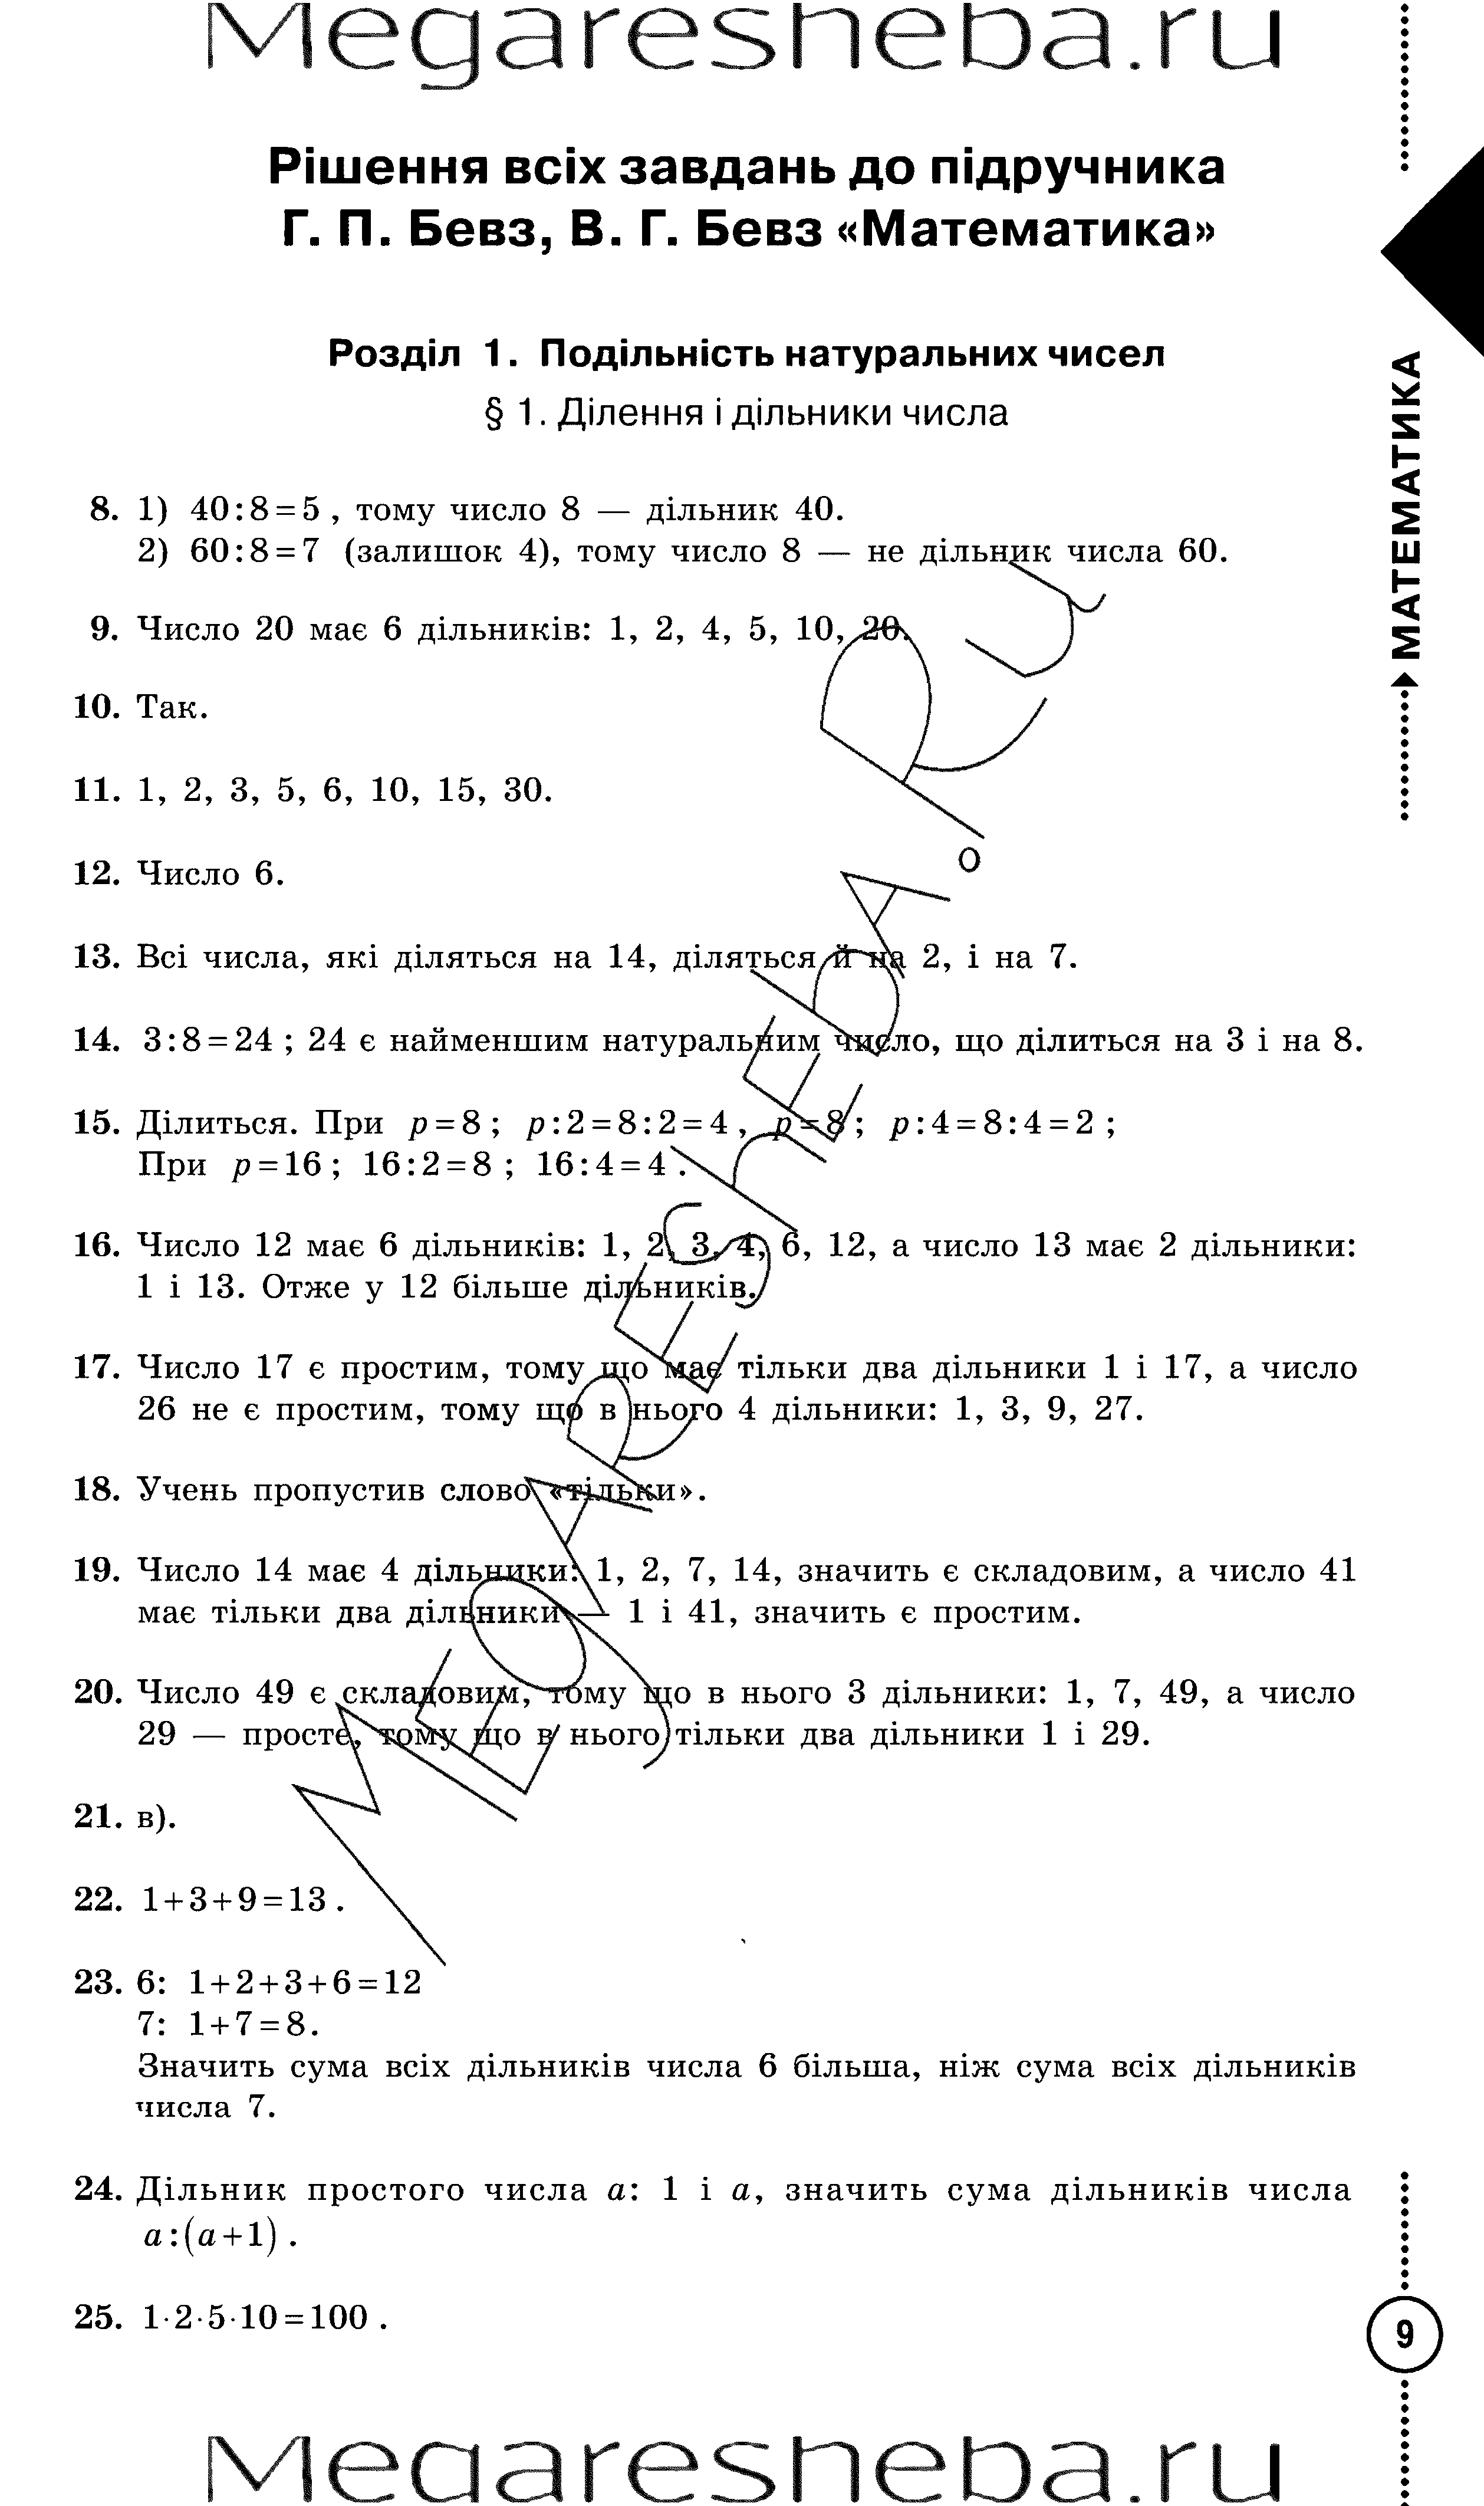 Математика 6 класс ответы бевз